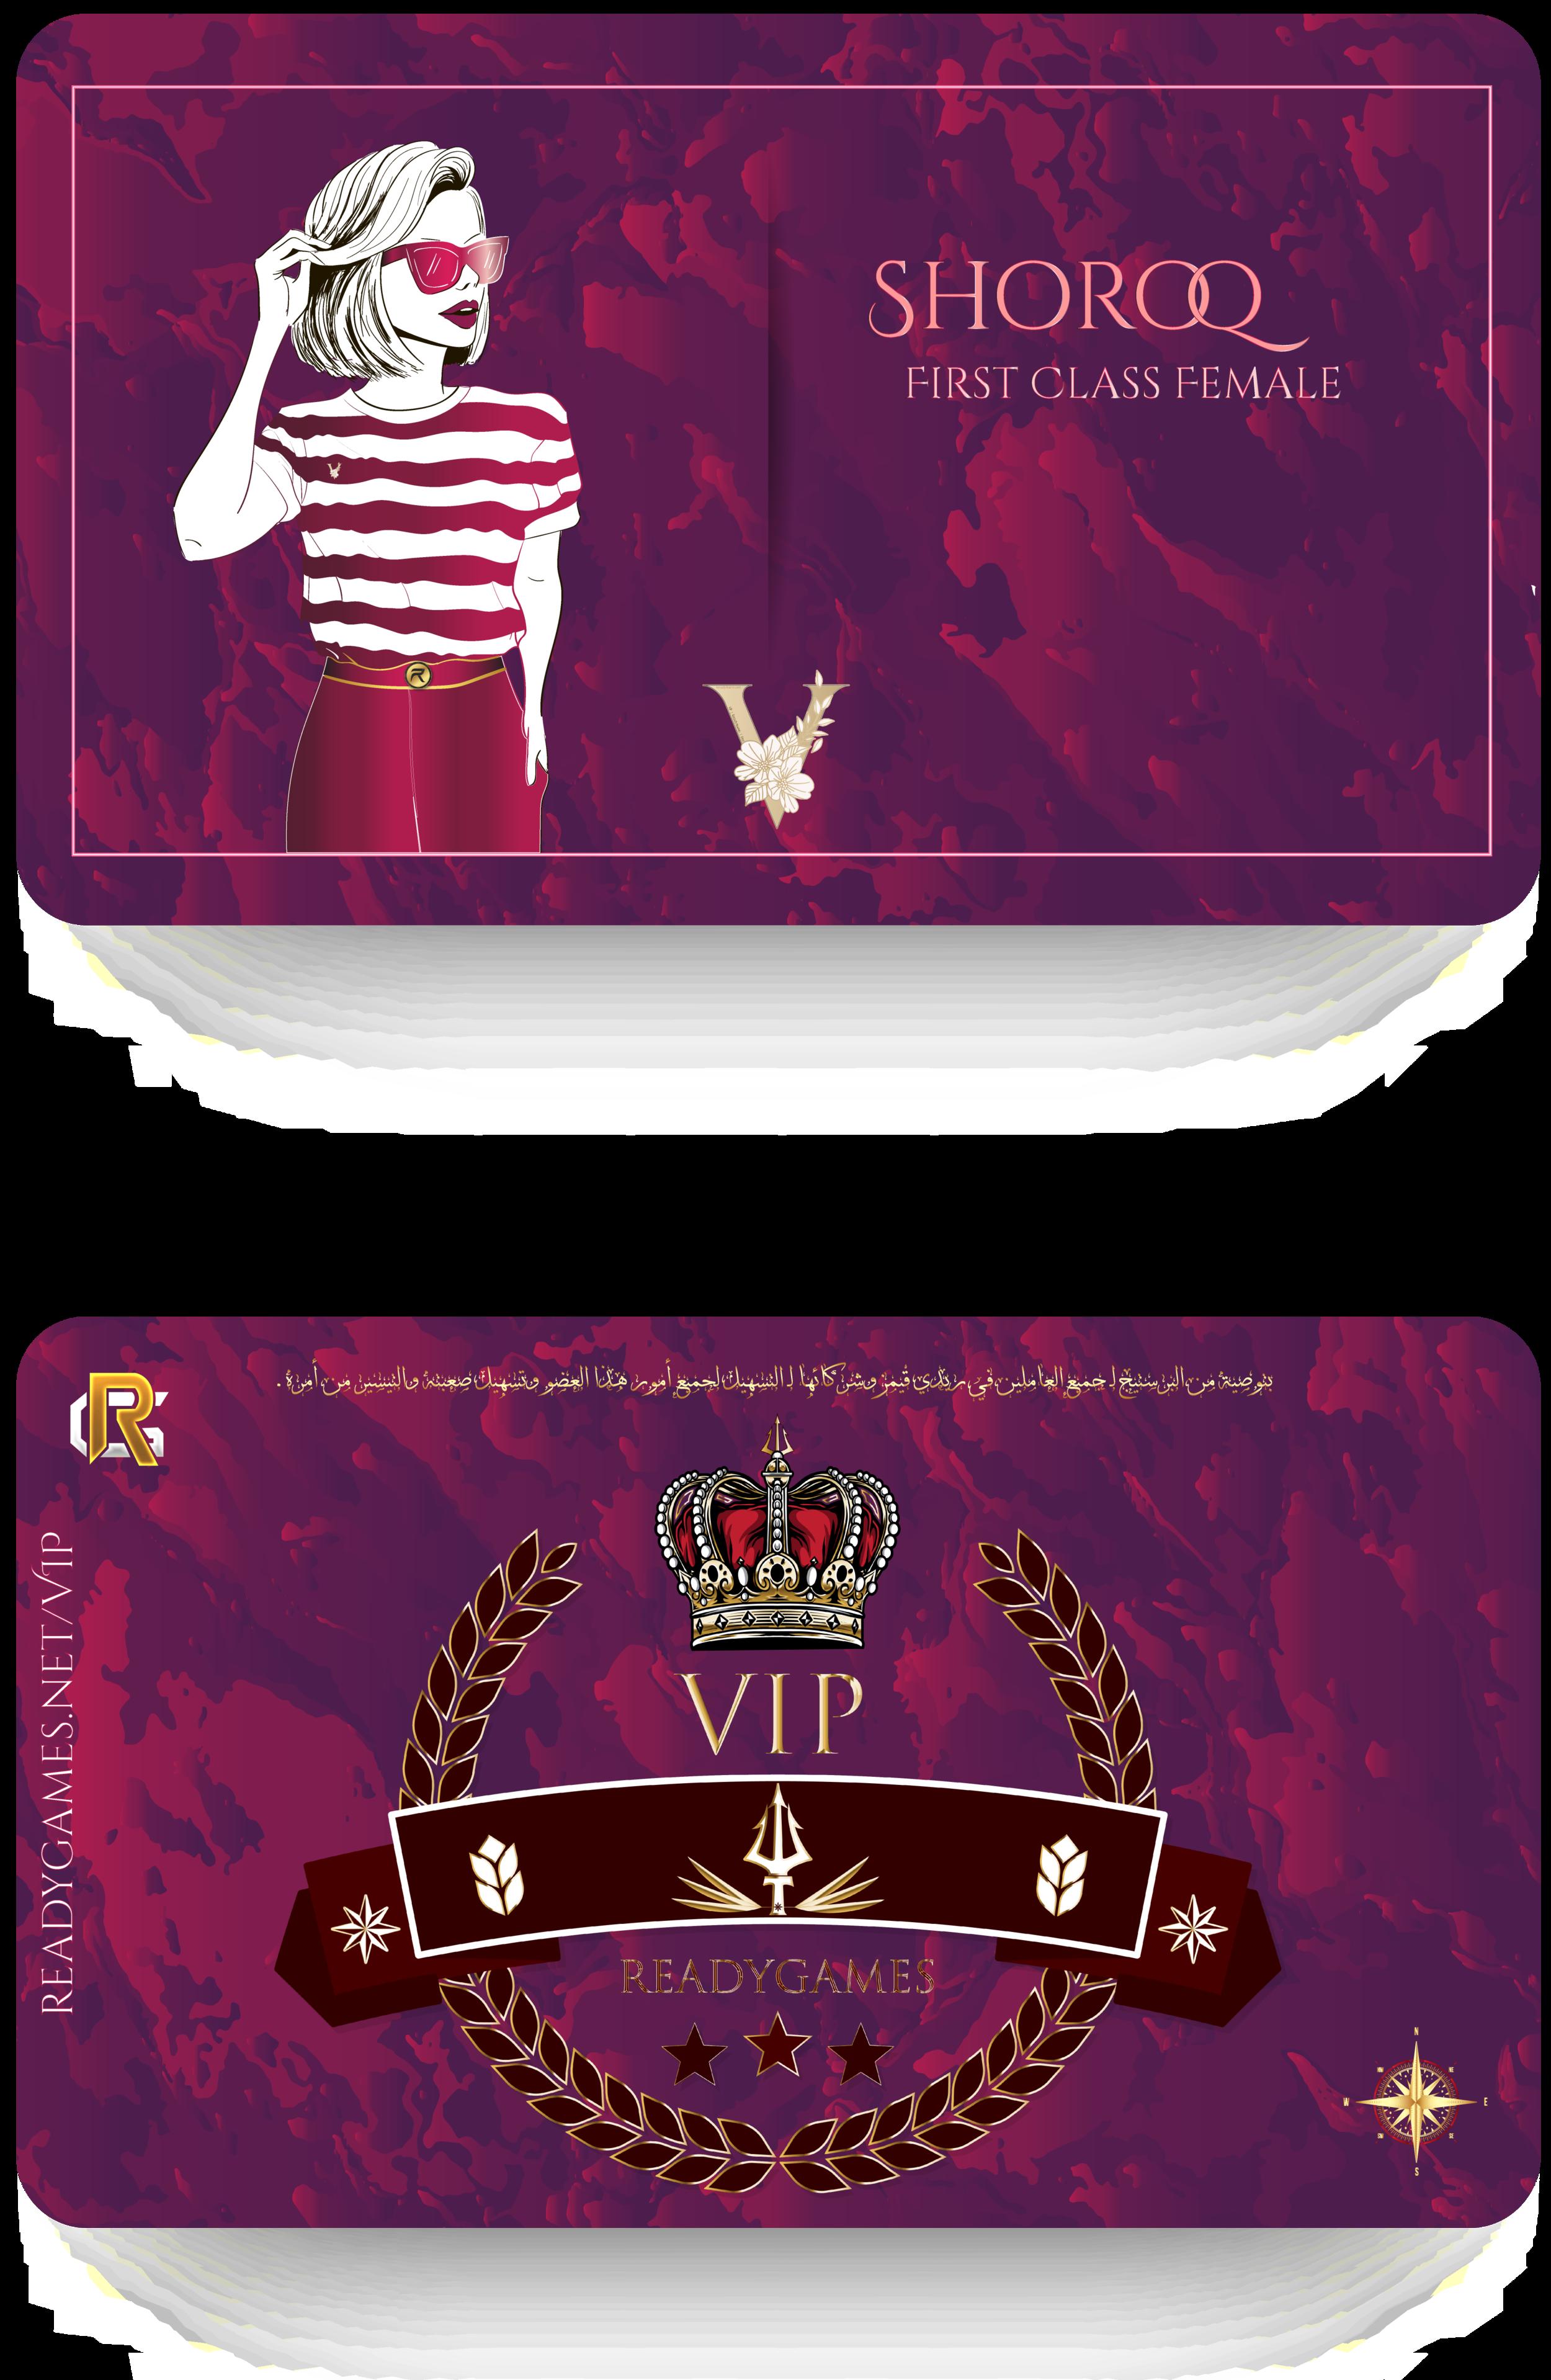 VIP-Male-FirstClassجديد22.png